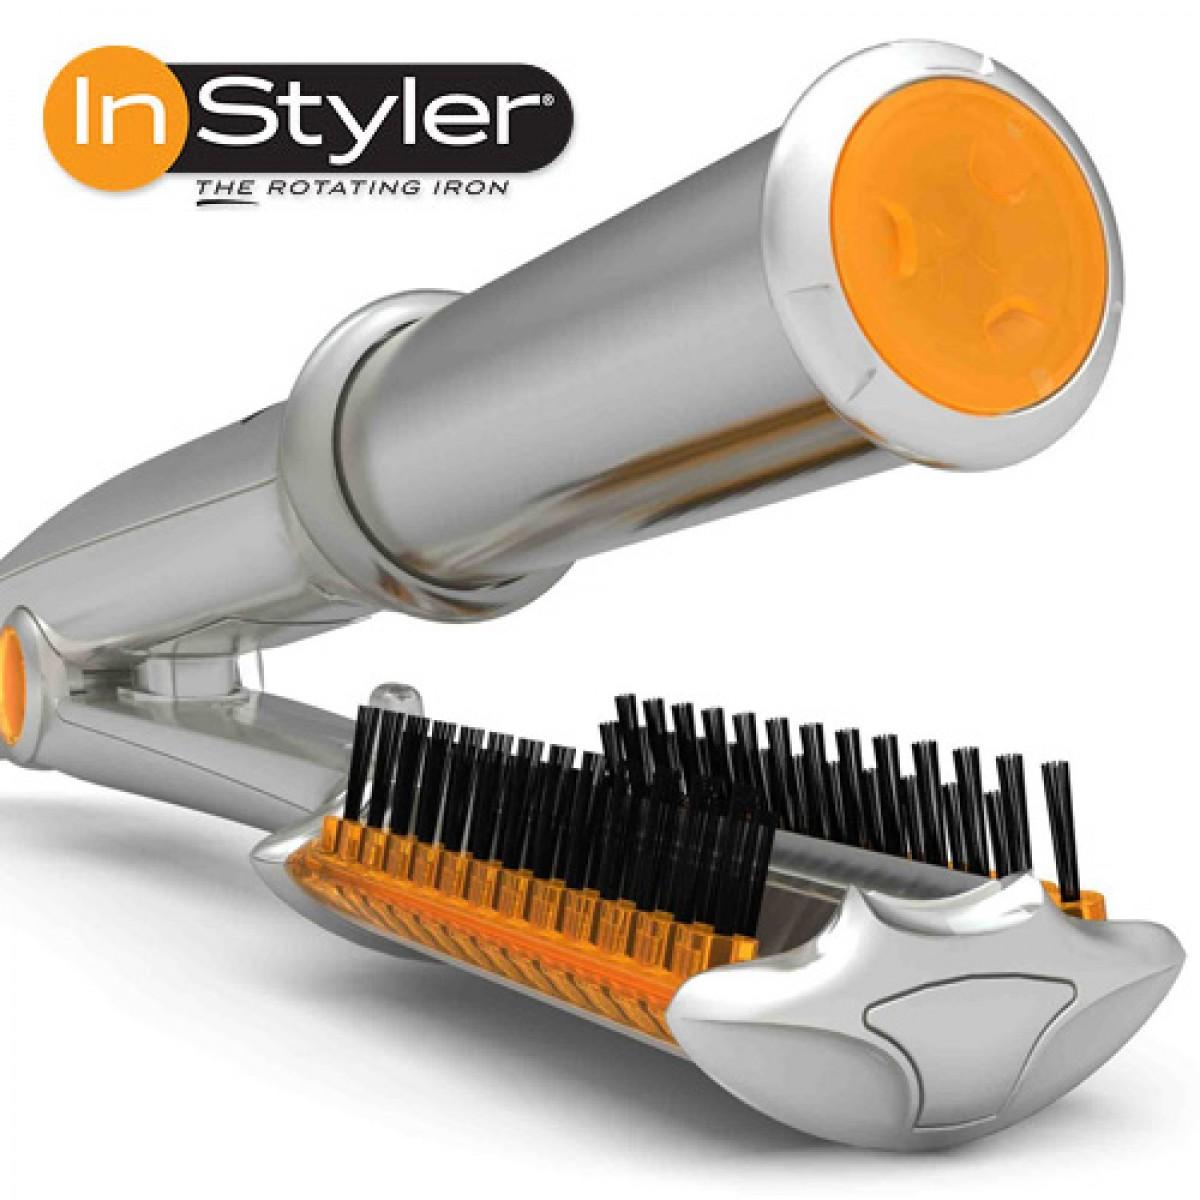 InStyler- Περιστρεφομένη Συσκευή Styling για ίσιωμα και μπούκλες OEM v110